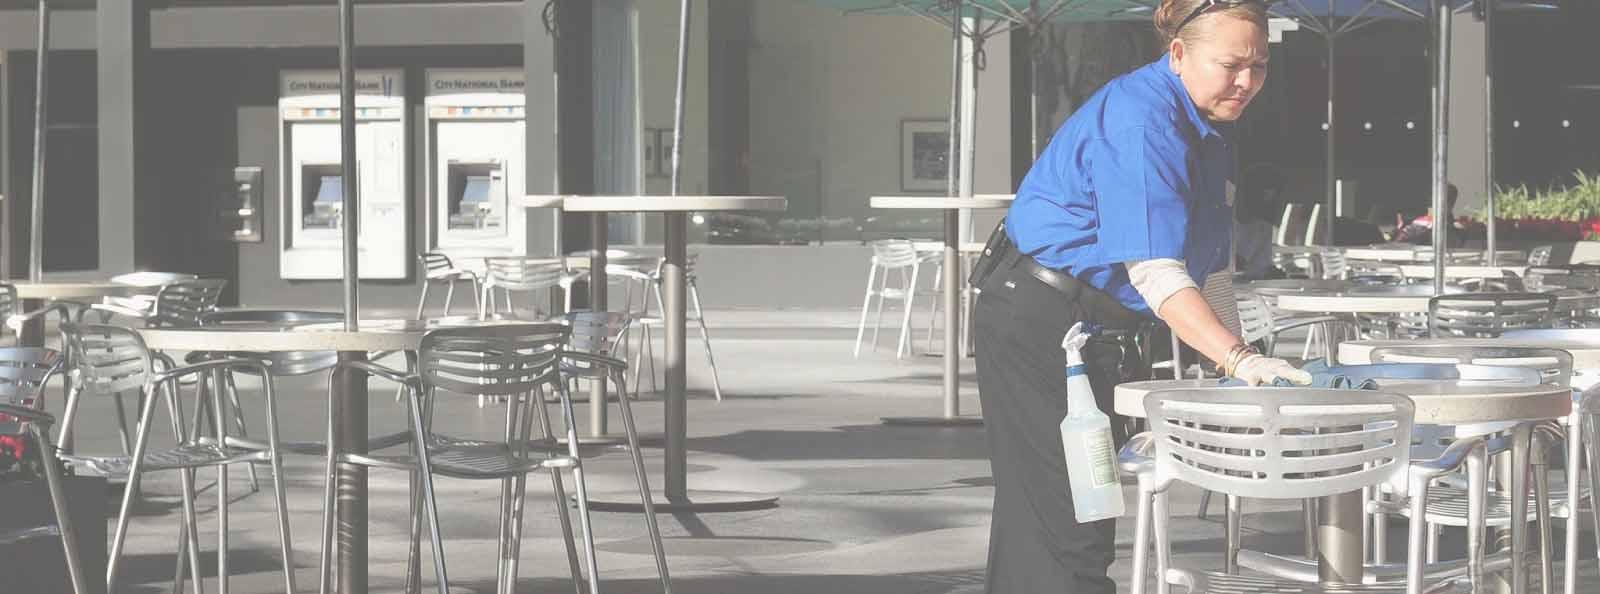 limpiar restaurantes